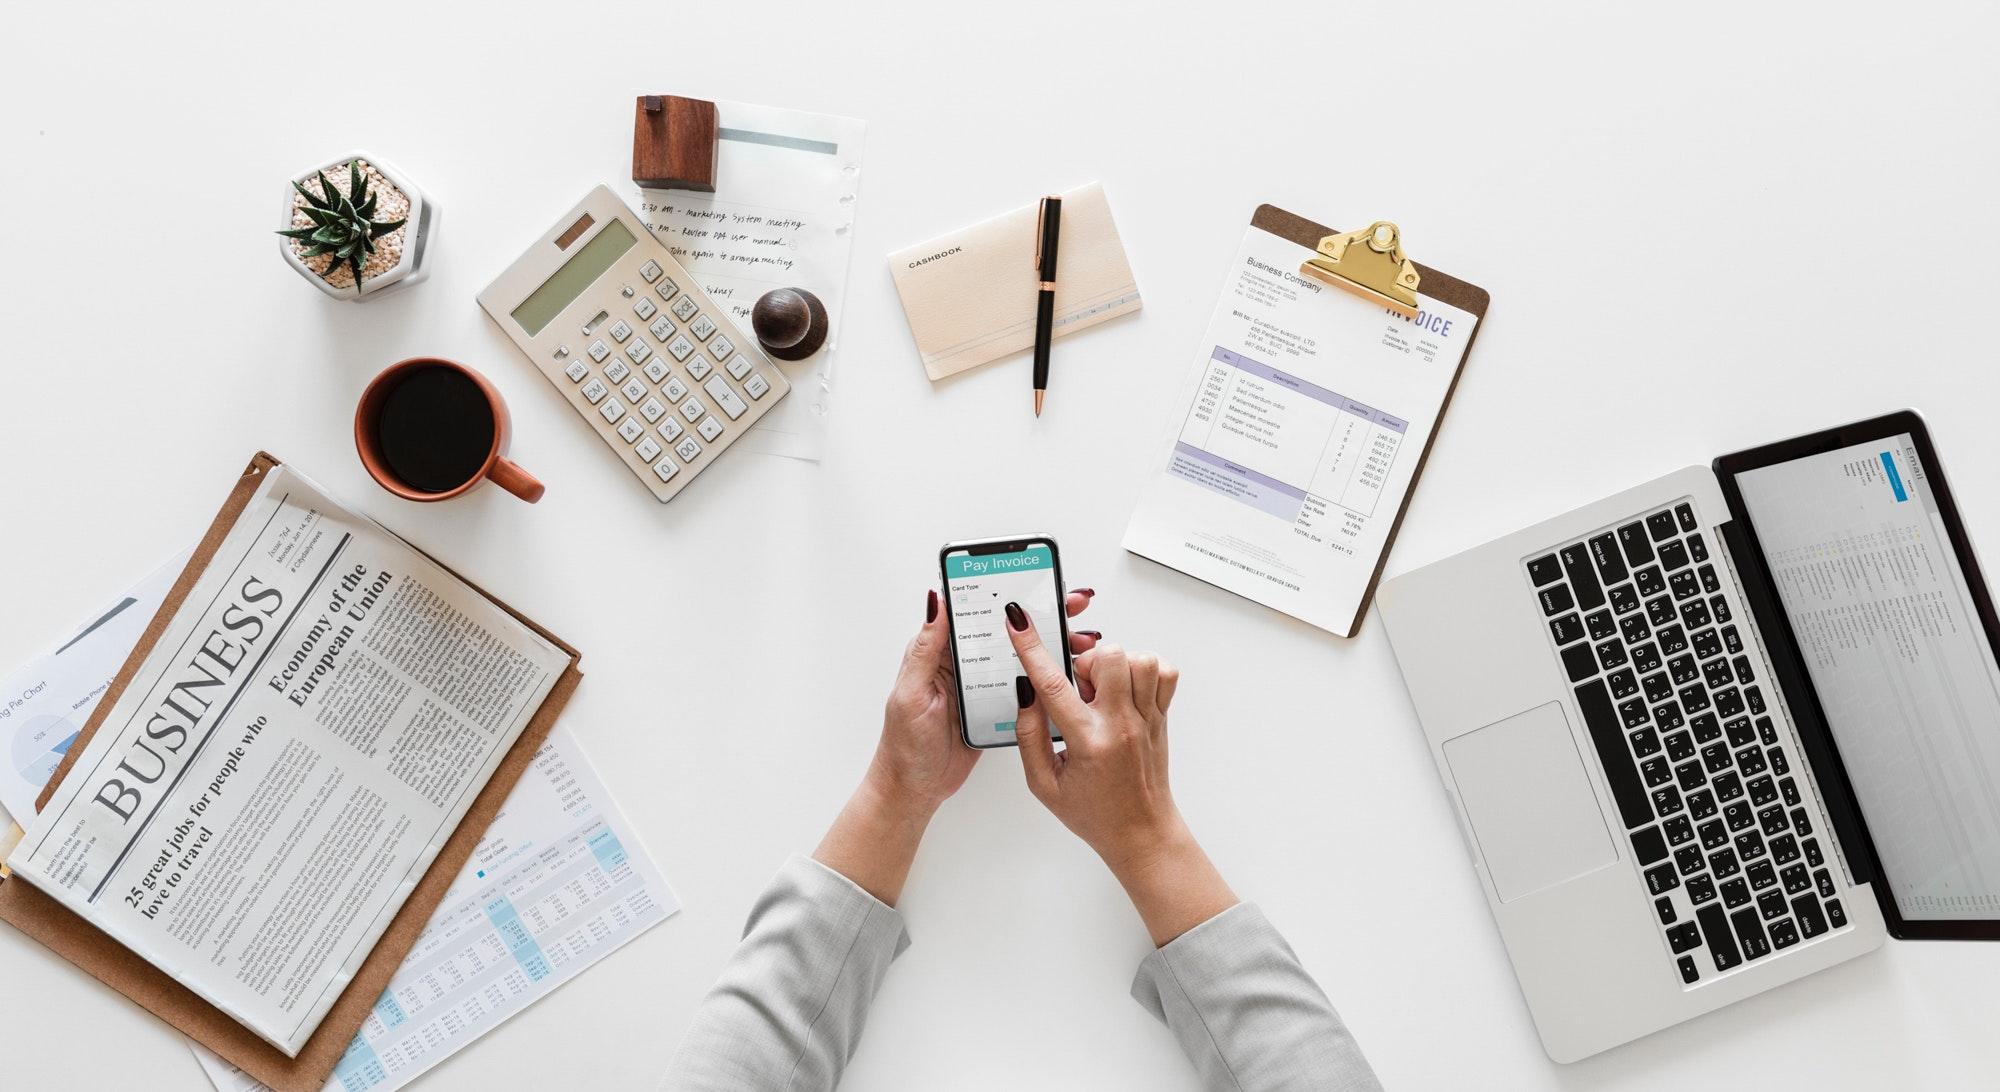 Business analysis and writing